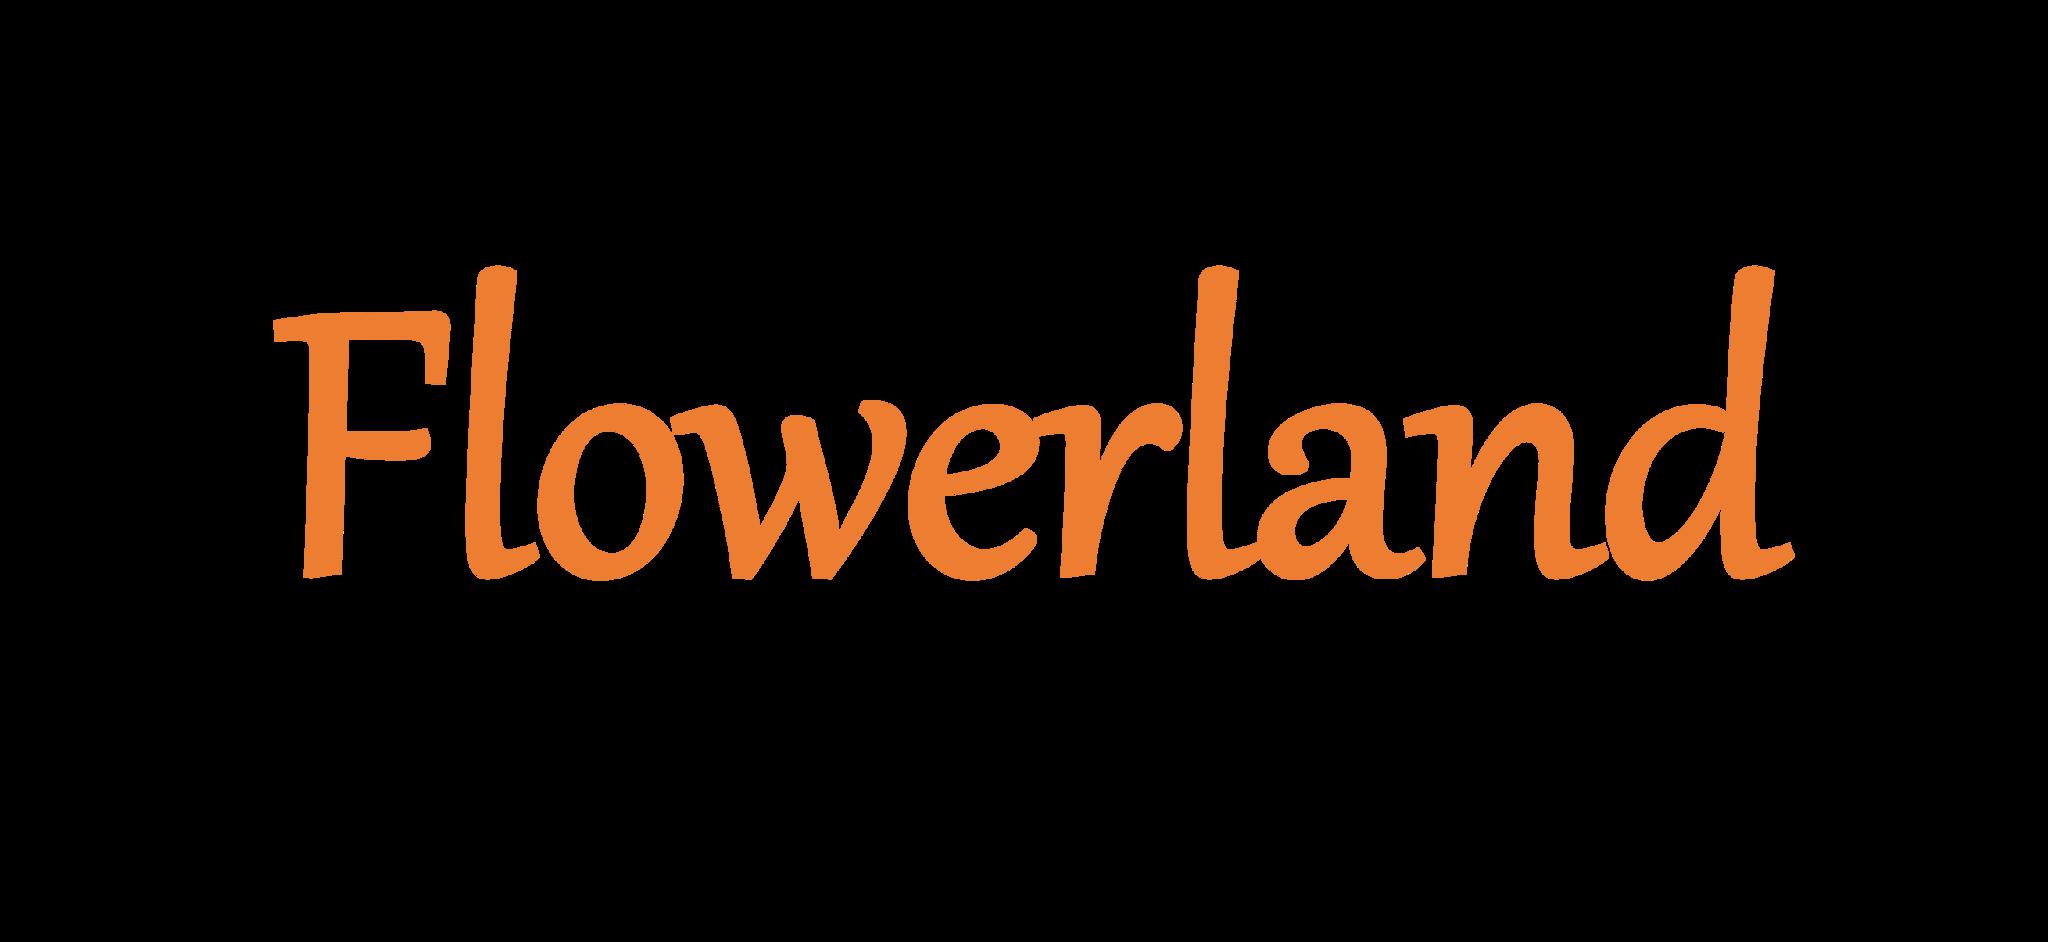 Flowerland - Florists & Flower Shops